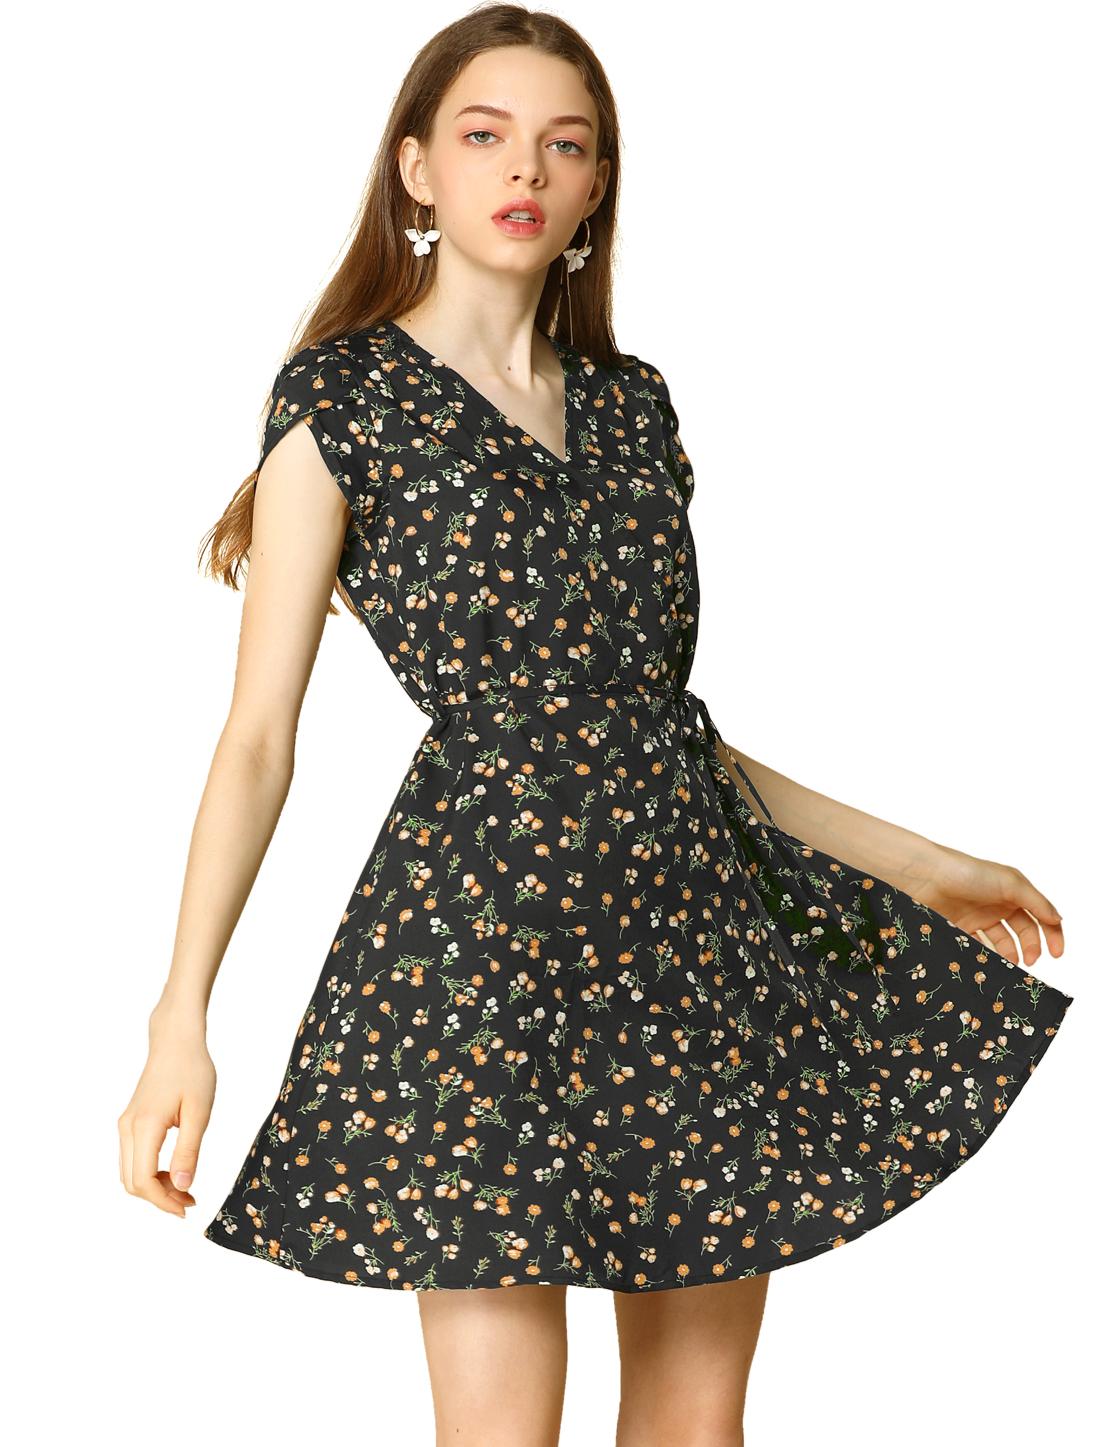 Allegra K Women's Floral Crossover V Neck Petal Sleeves Flowy Dress Black xs